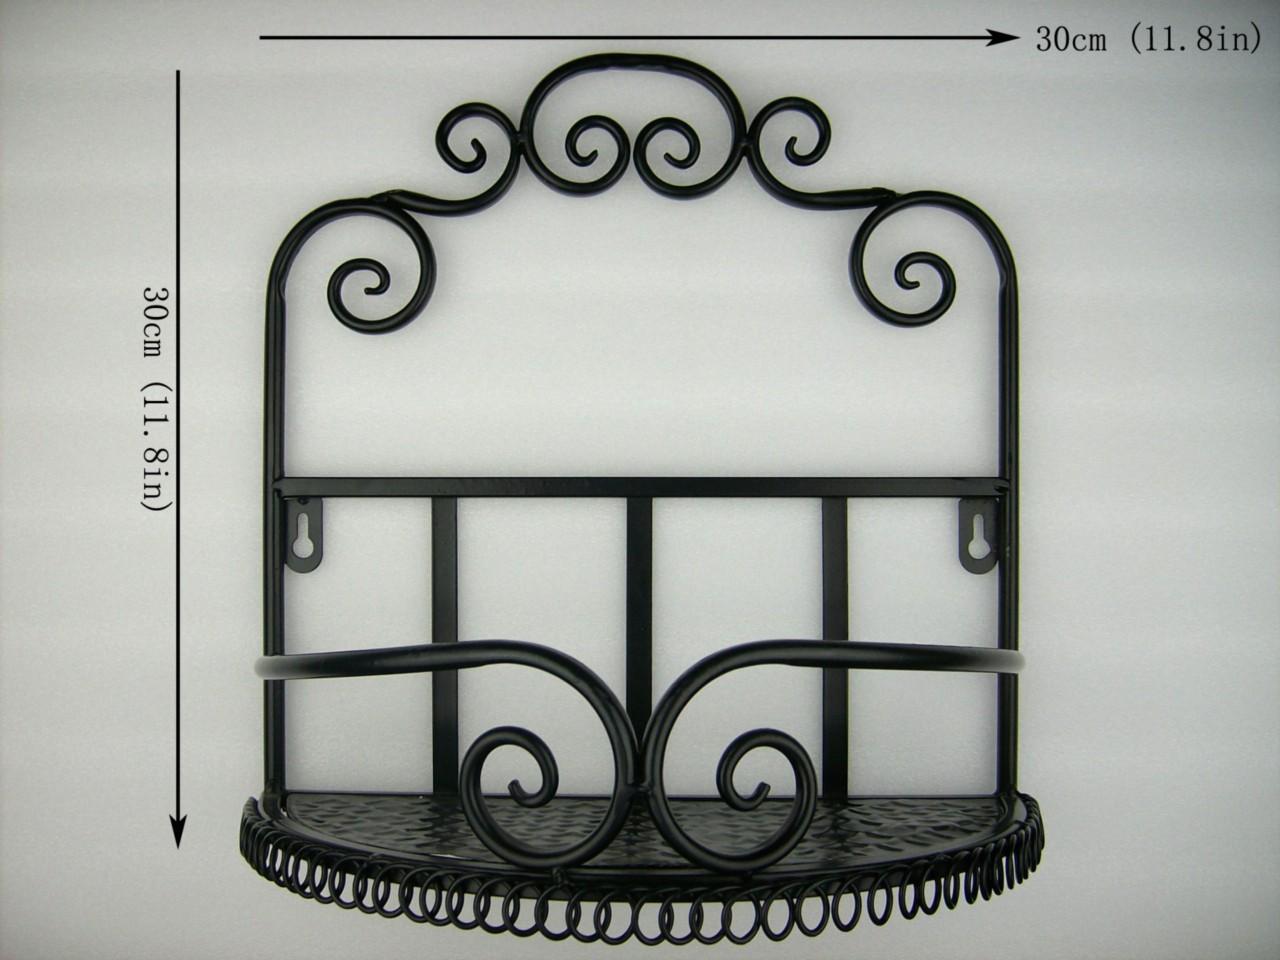 design iron bathroom toilet decorative wall shelf storage rack